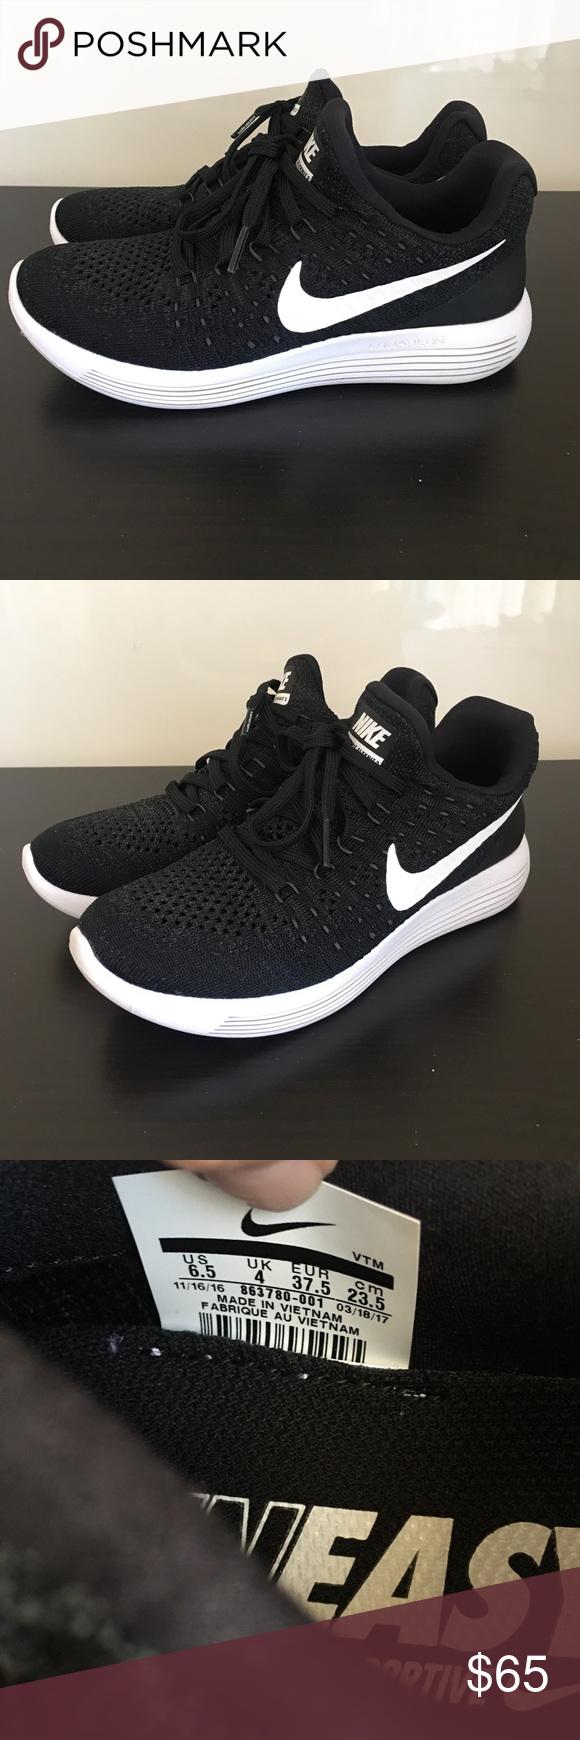 Women's Nike size 6.5 - worn once